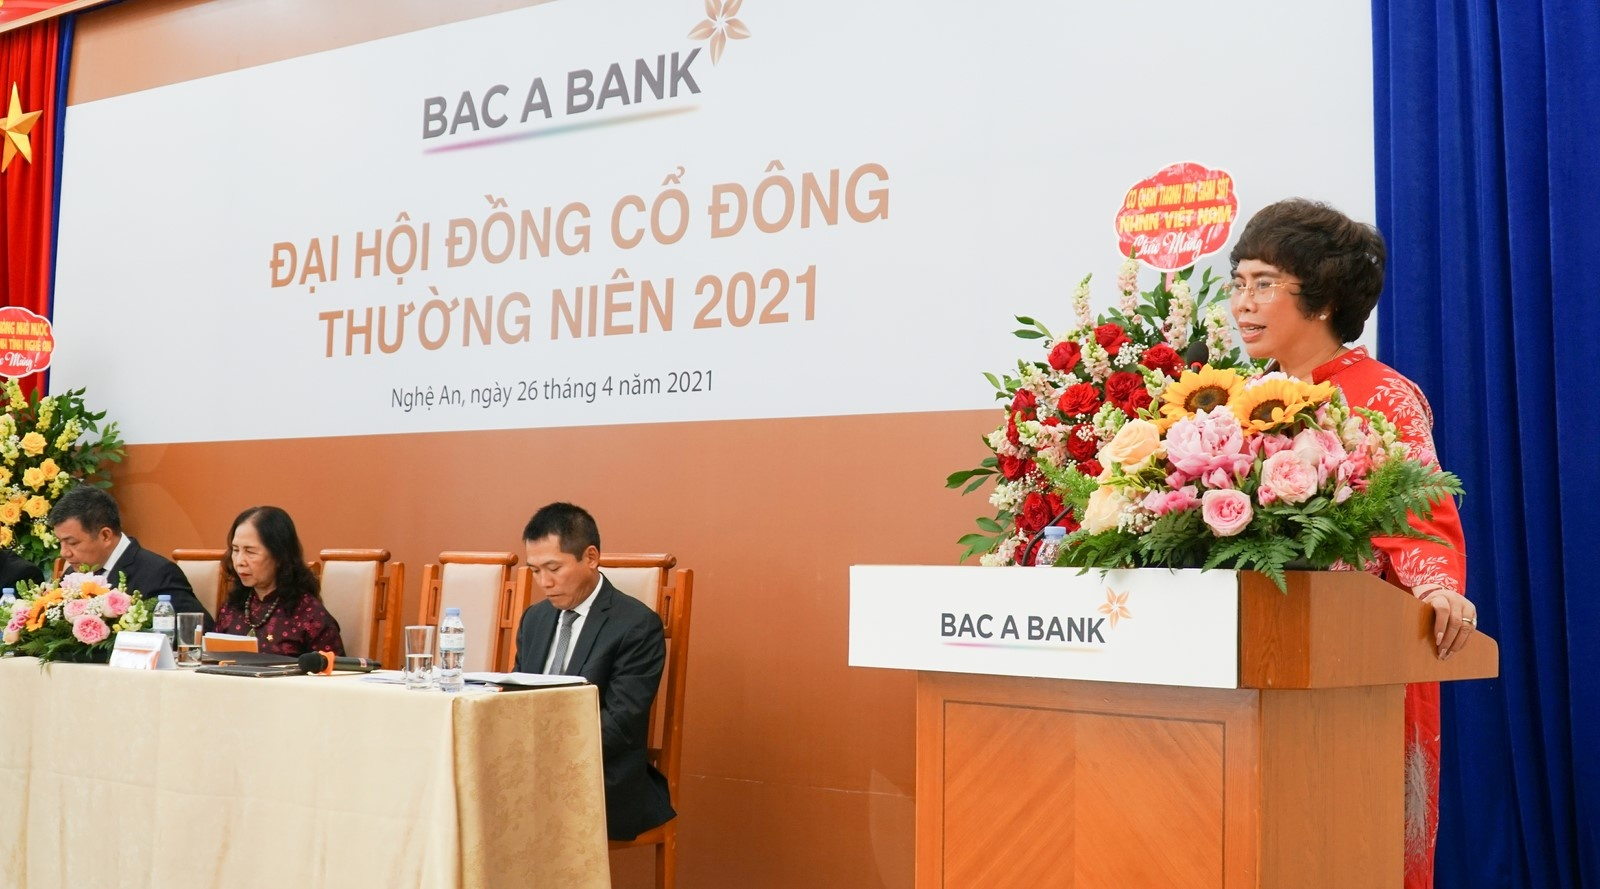 dai hoi dong co dong bac a bank thong qua phuong an tang von dieu le len 7531 ty dong